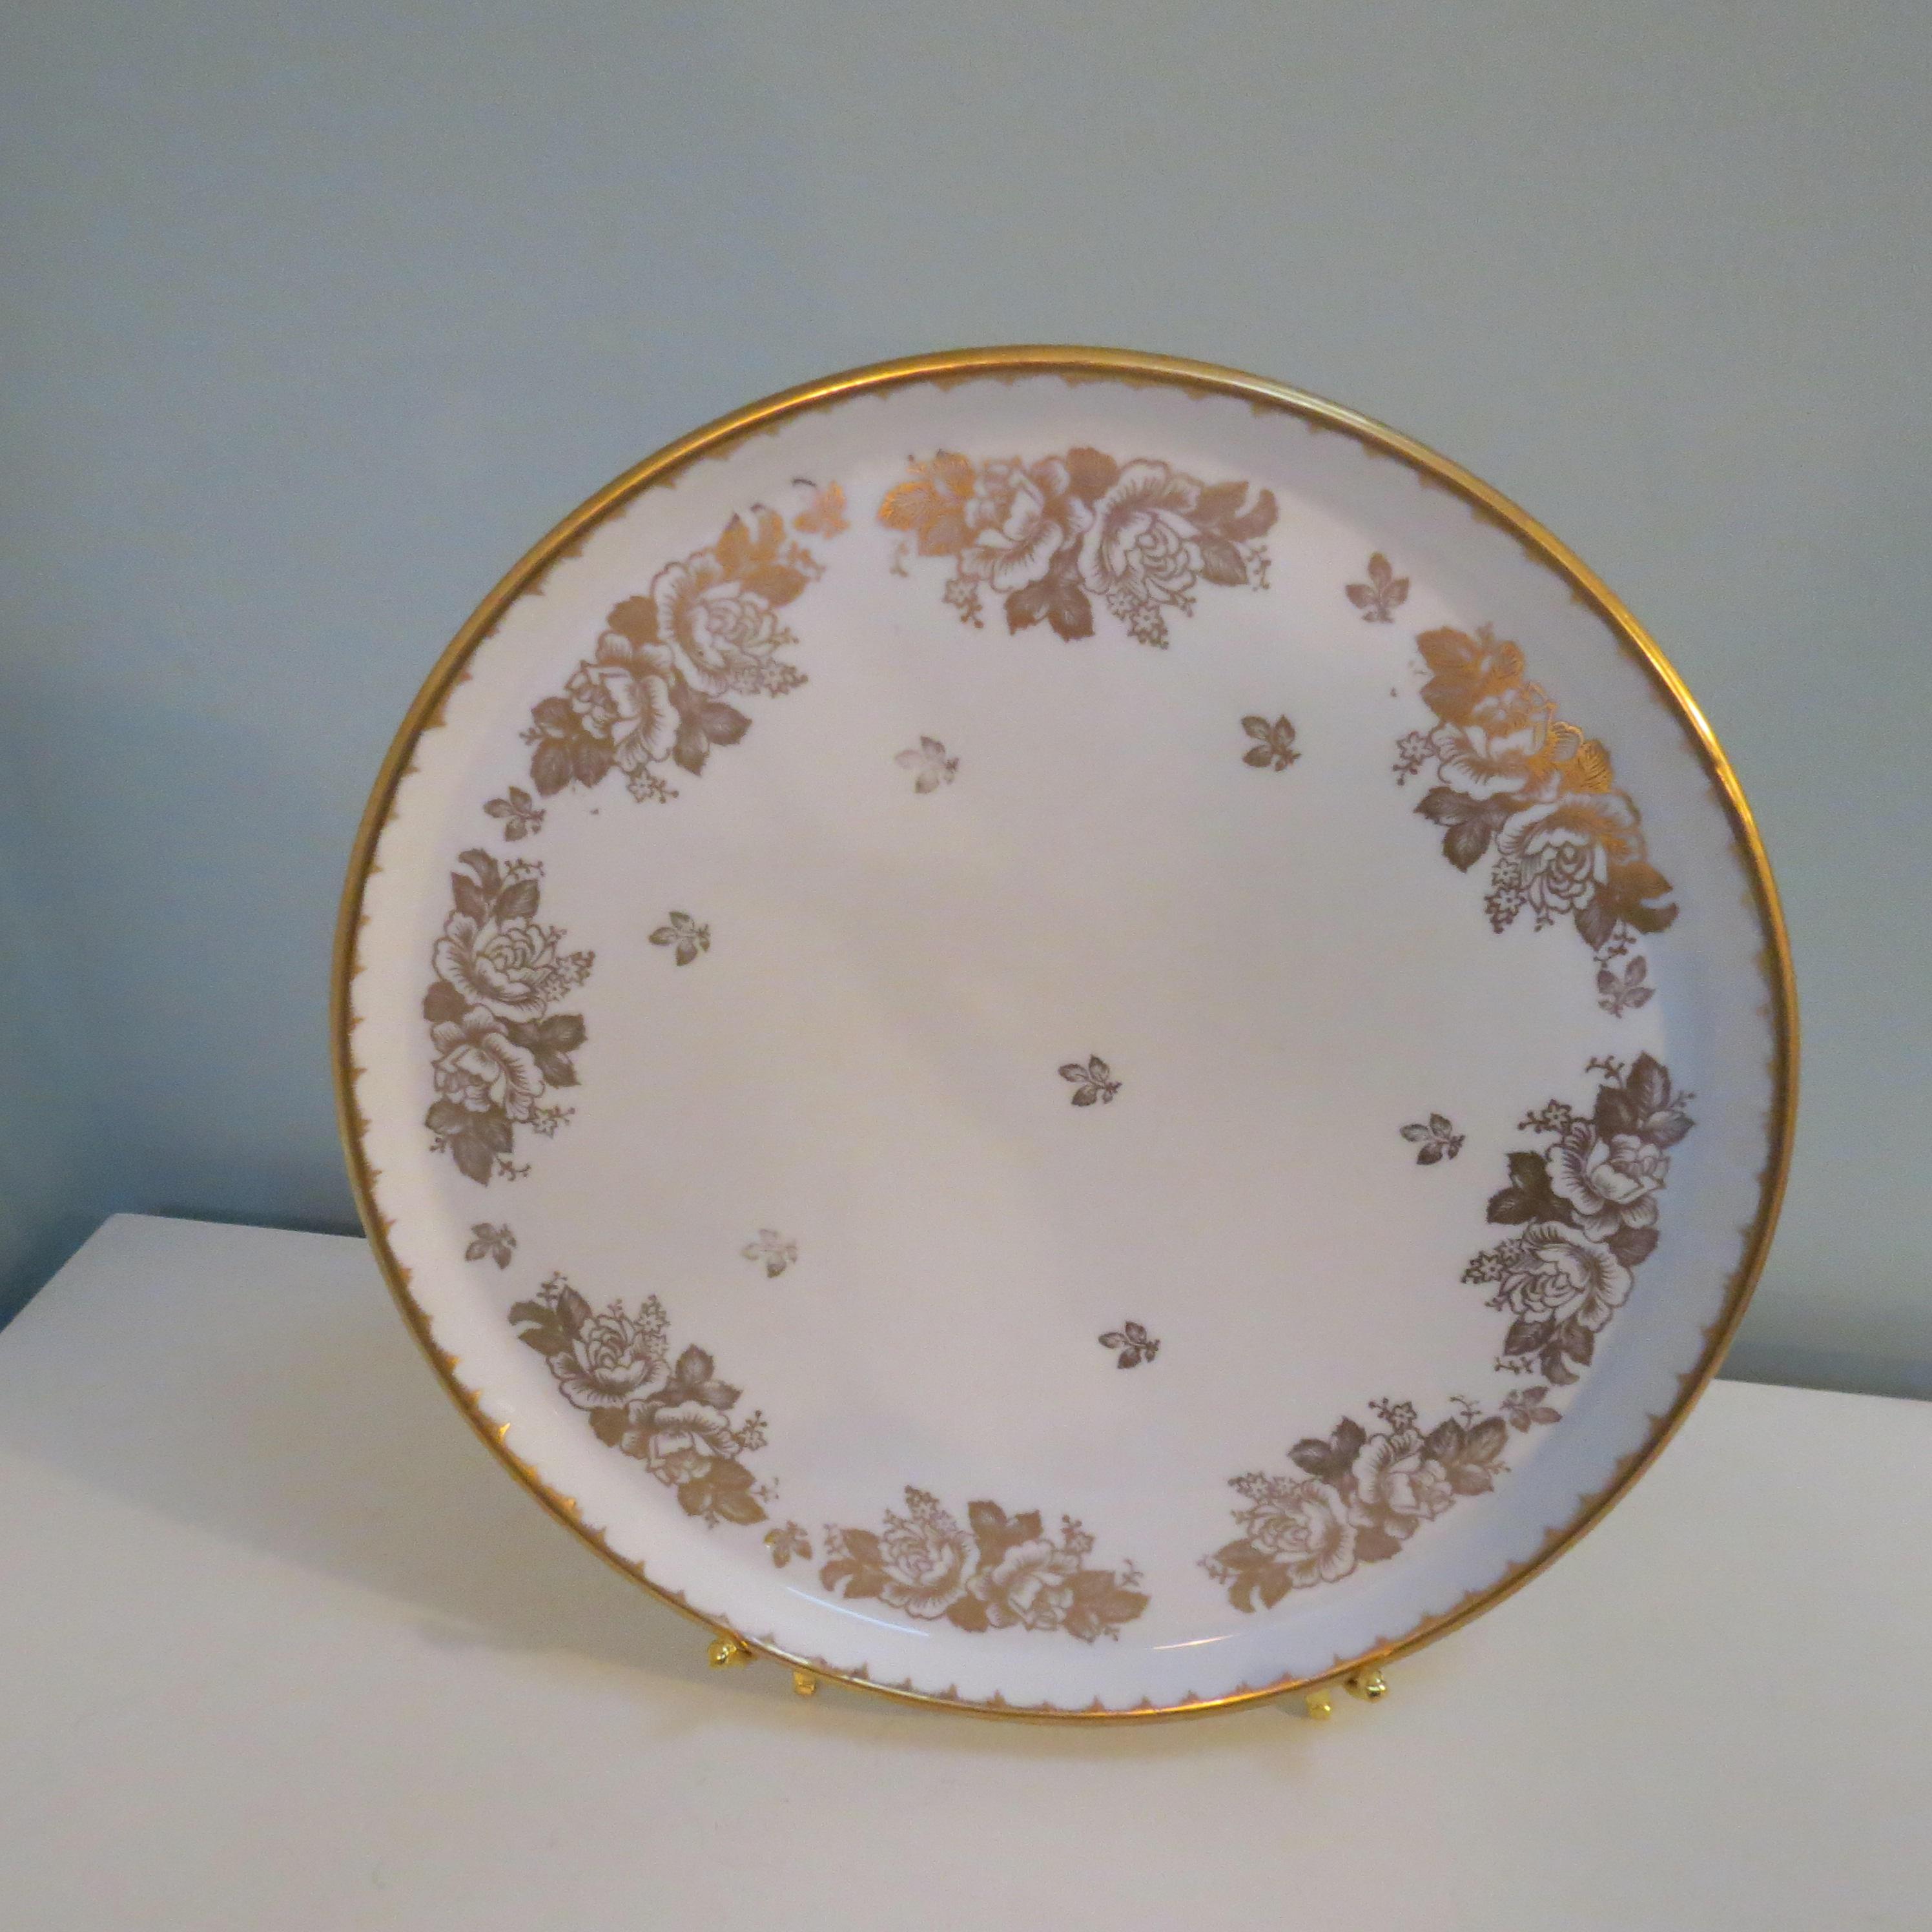 Image 3 of Antique Revol Porcelain China Plate